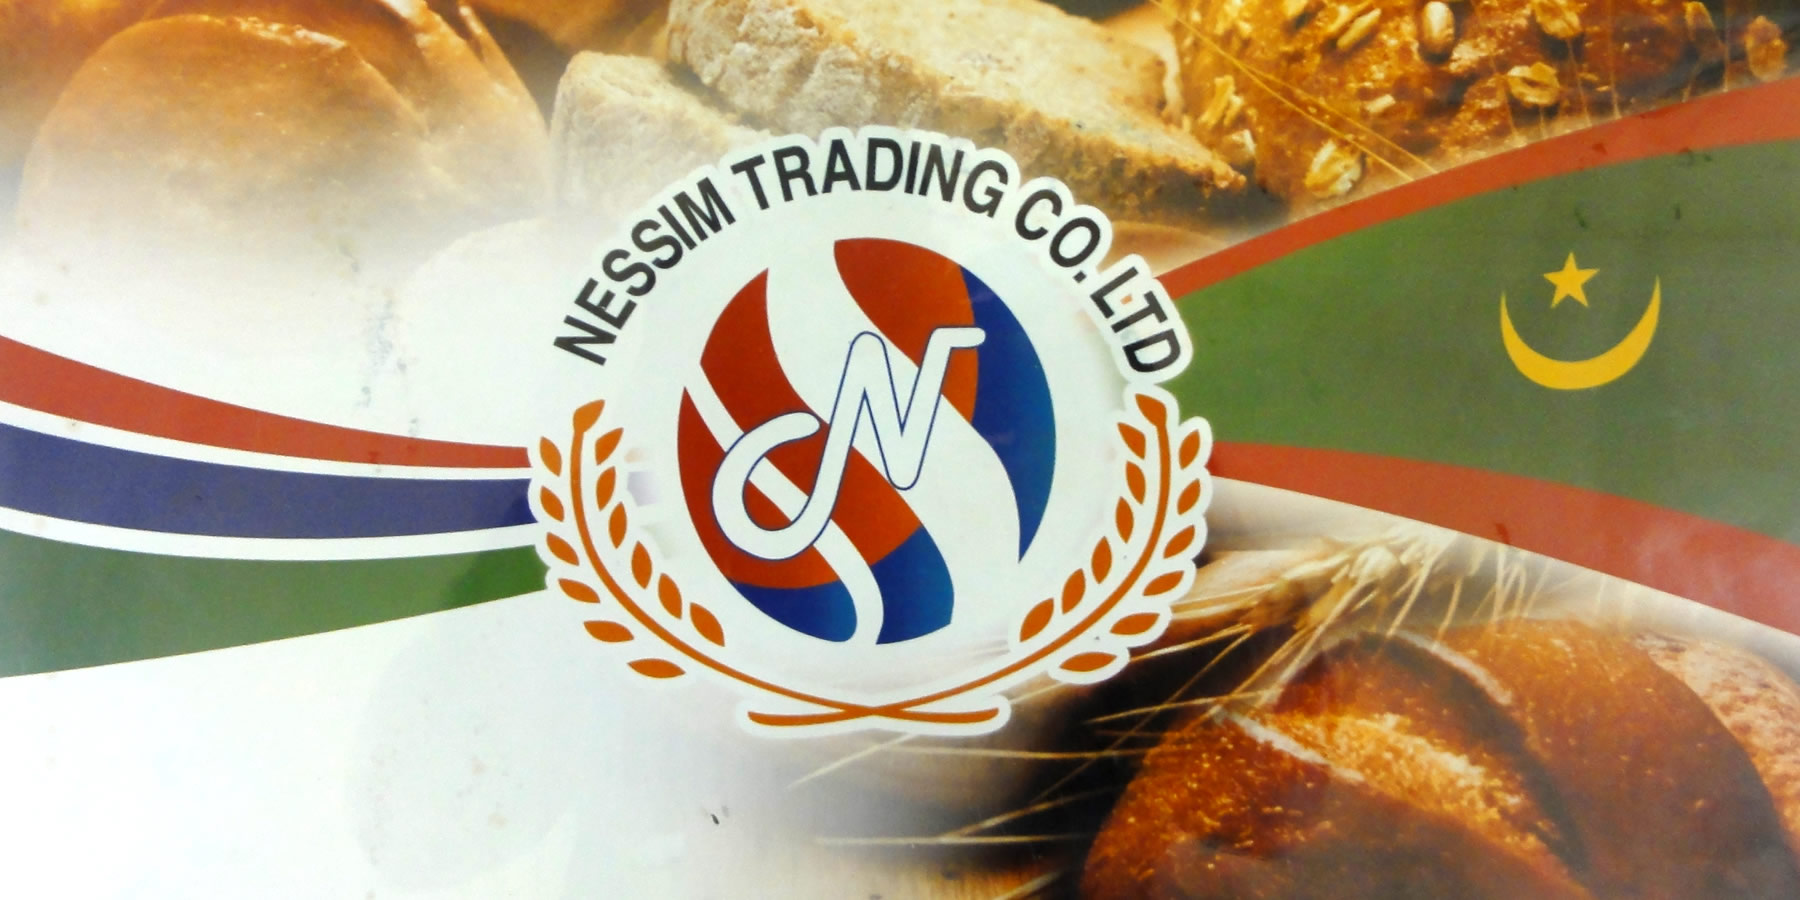 Nessim Trading Company Ltd